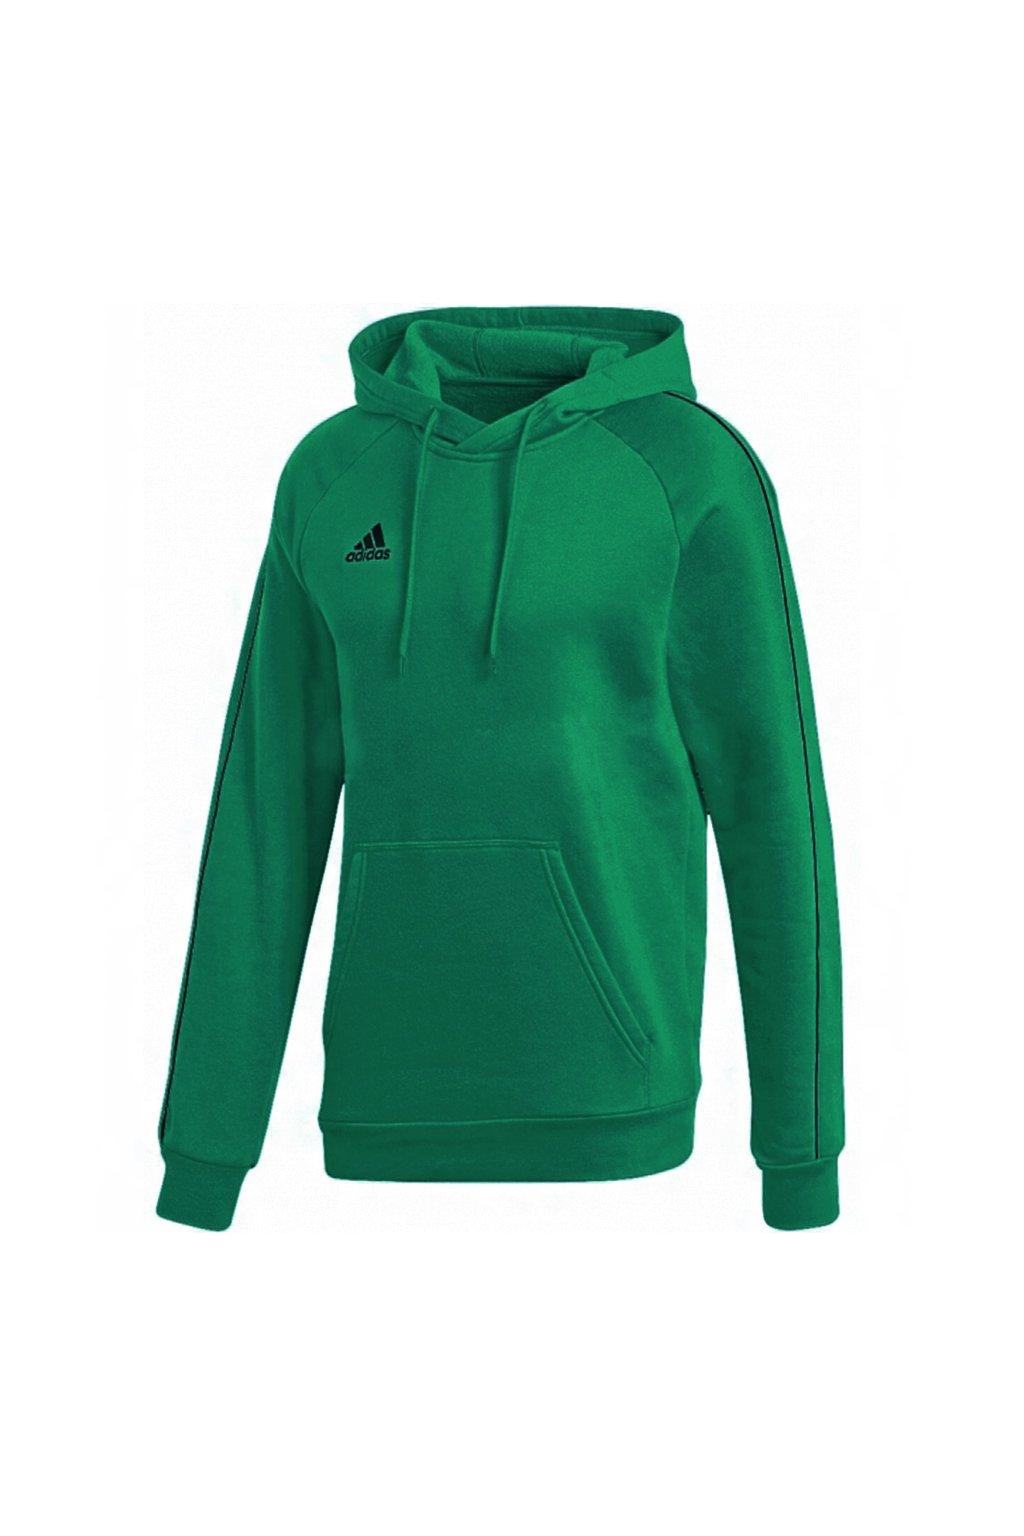 Pánska mikina Adidas Core 18 Hoody green FS1894